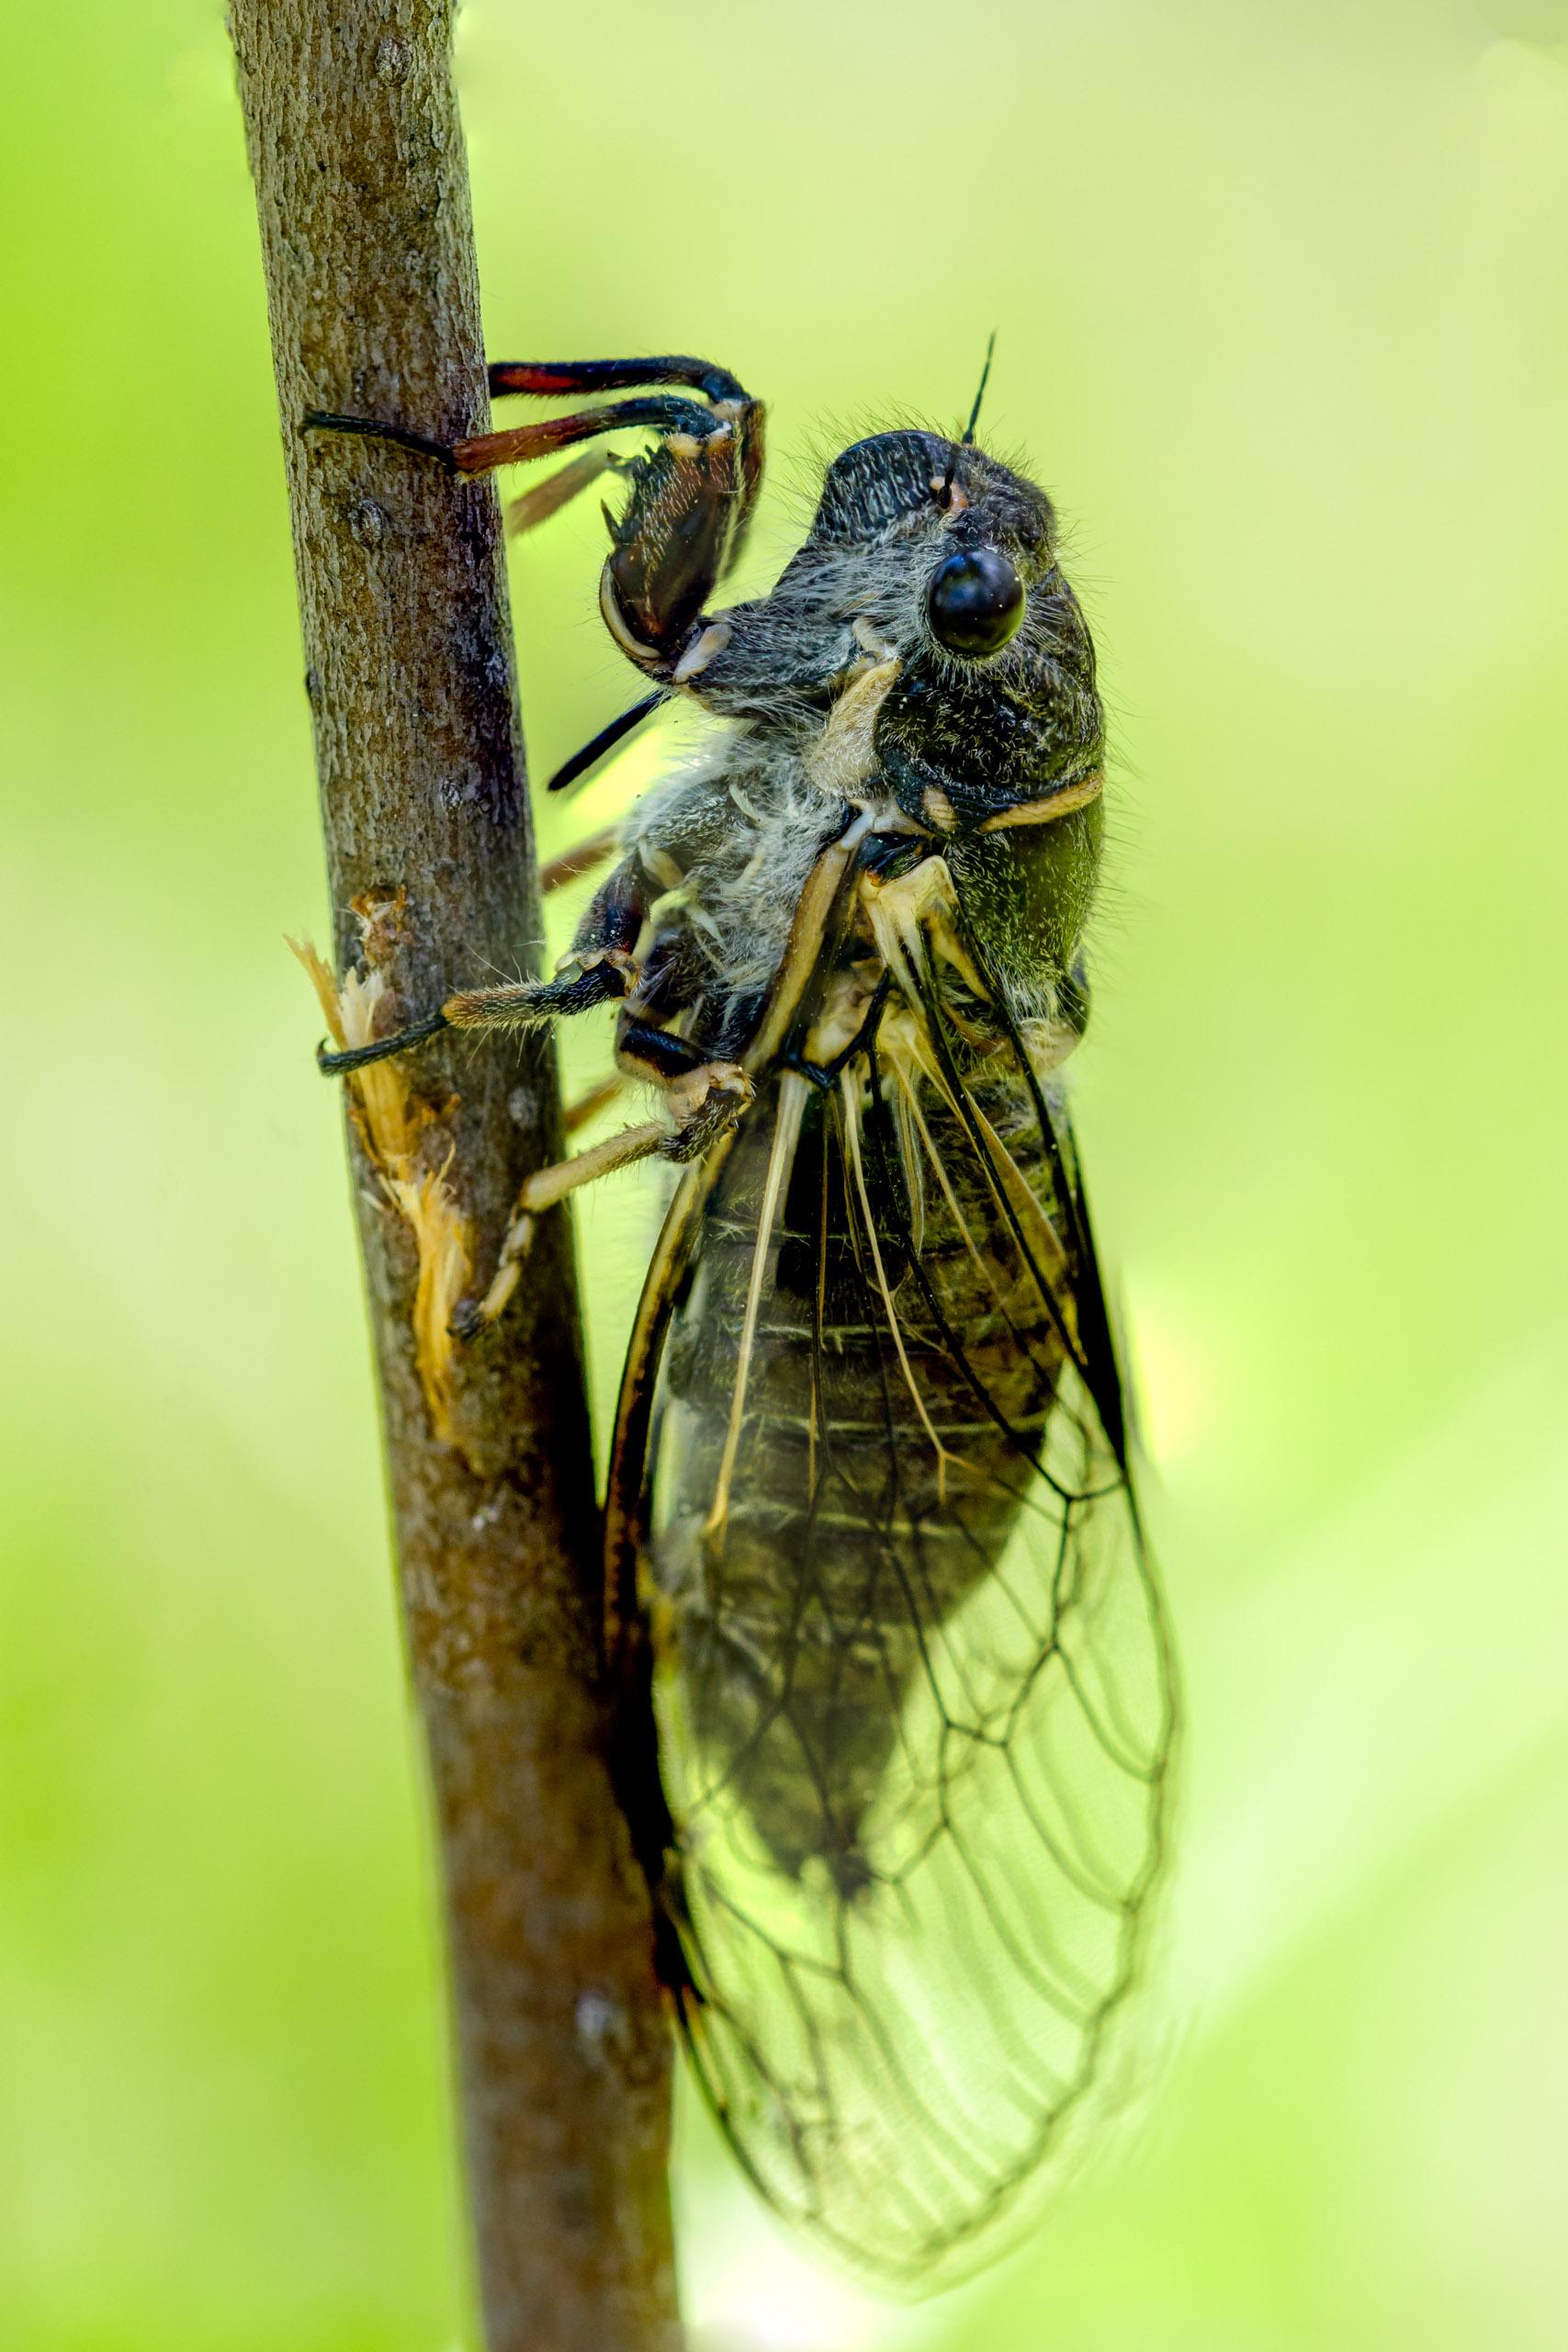 Putnam's Cicada - bio-nerd moment